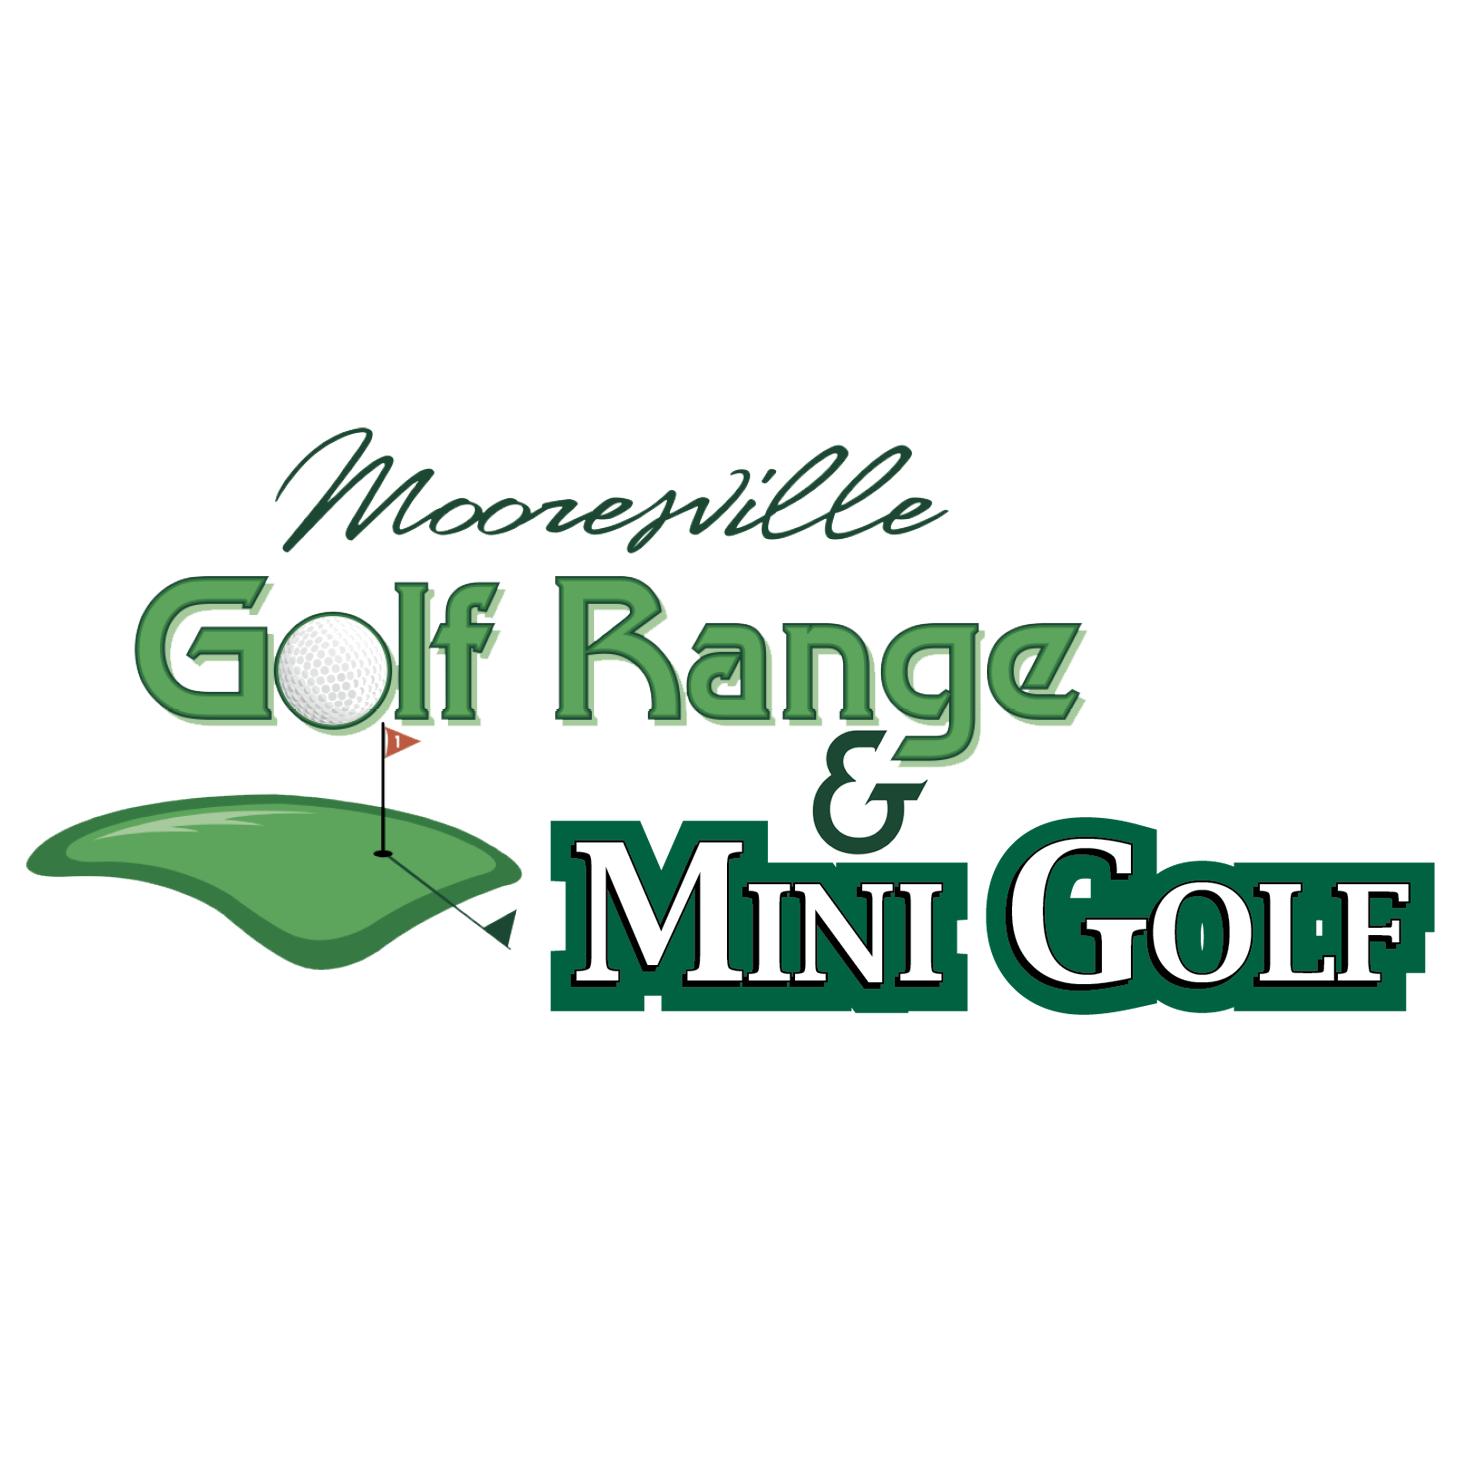 Mooresville Golf Range & Mini Golf - Mooresville, NC - Golf